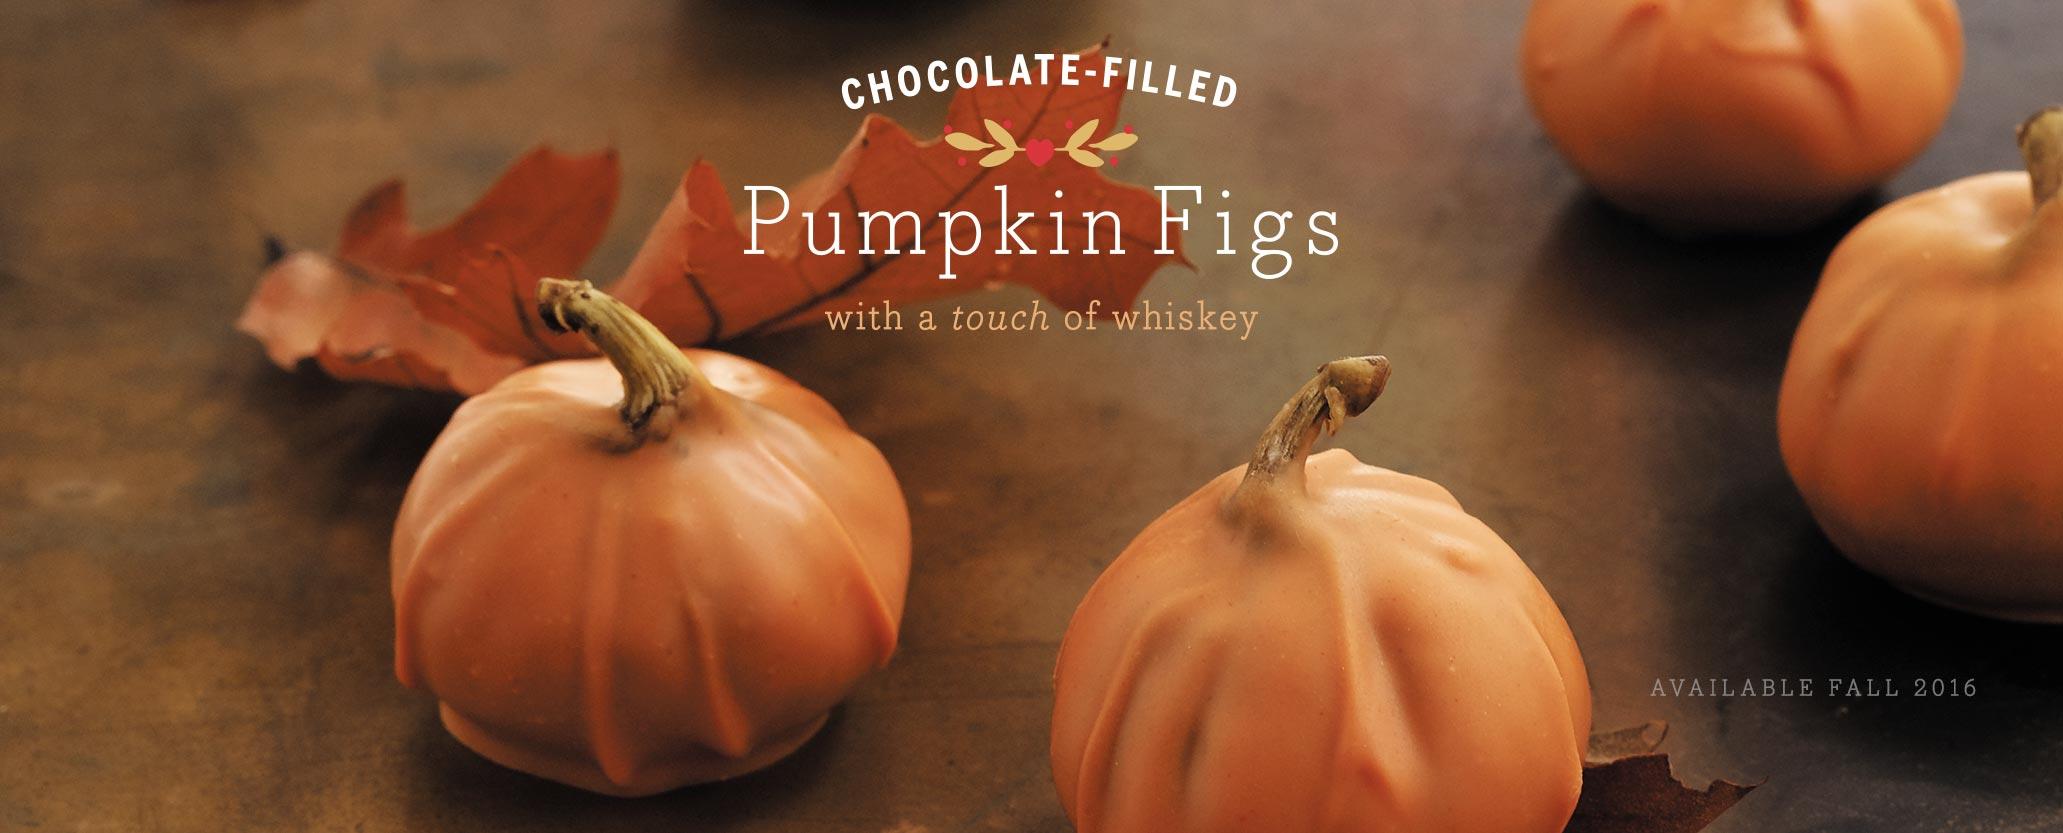 Pumpkin Figs